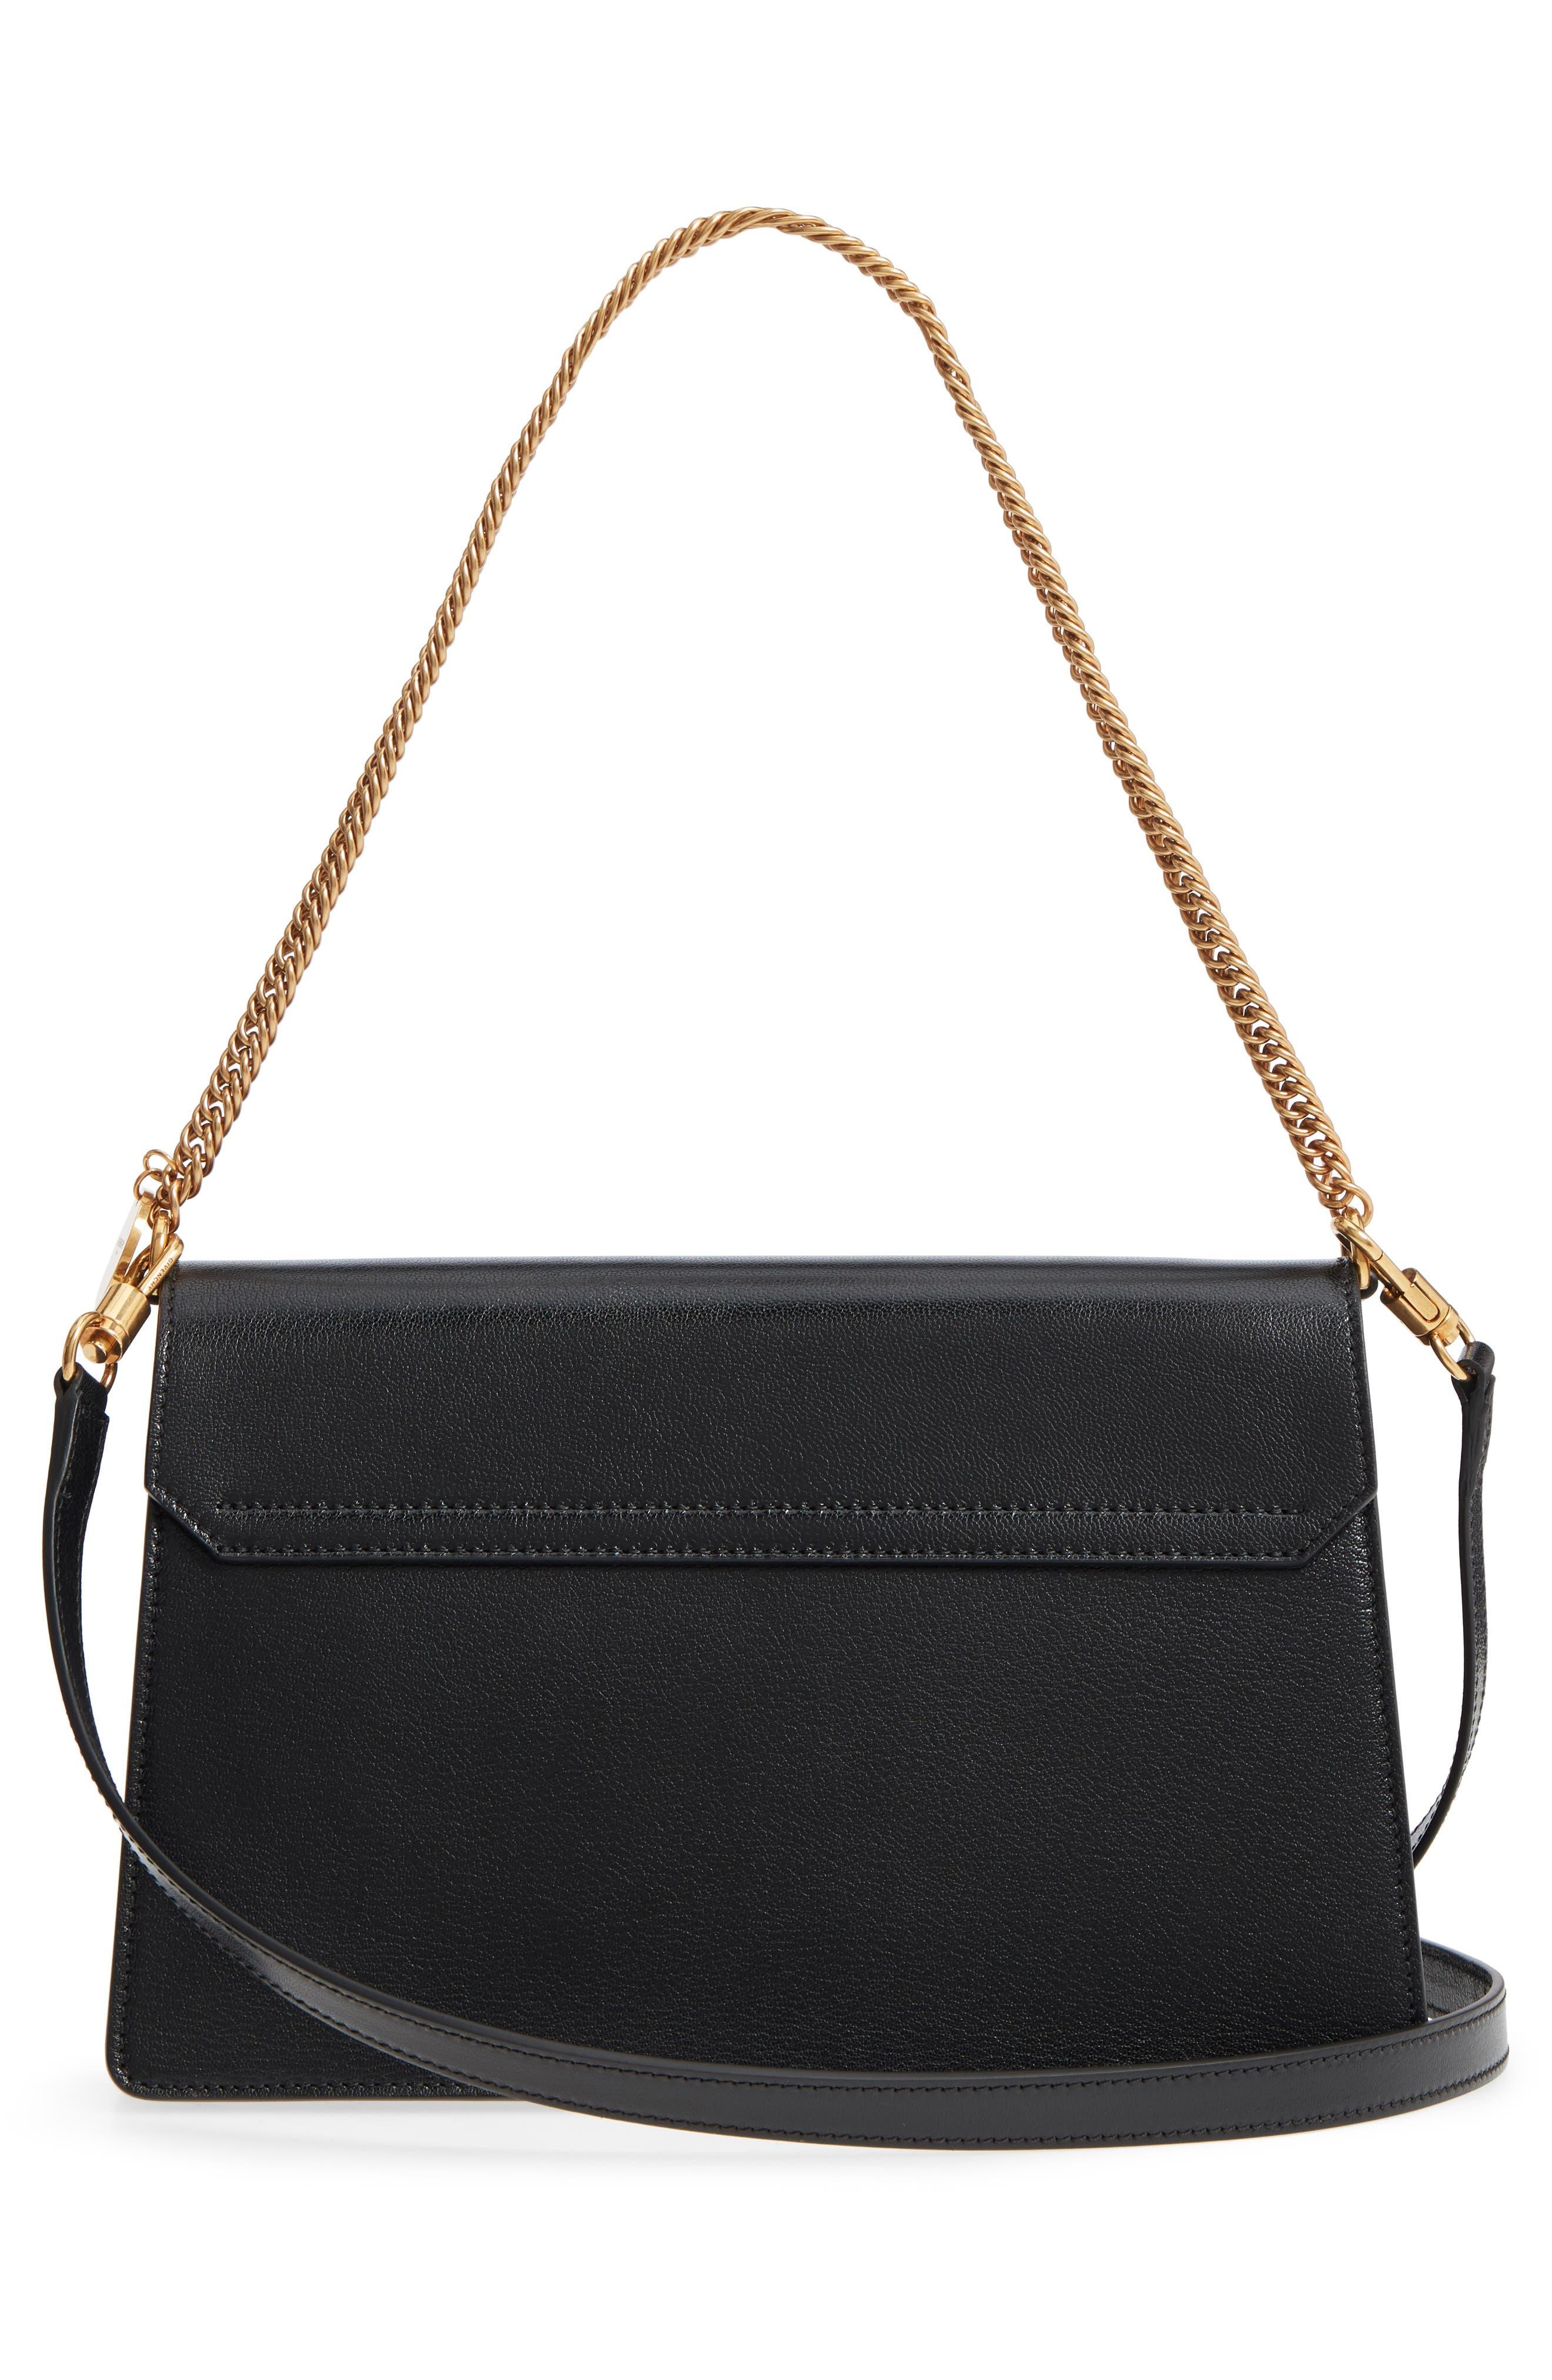 Medium GV3 Leather Crossbody Bag,                             Alternate thumbnail 3, color,                             BLACK/ GREY